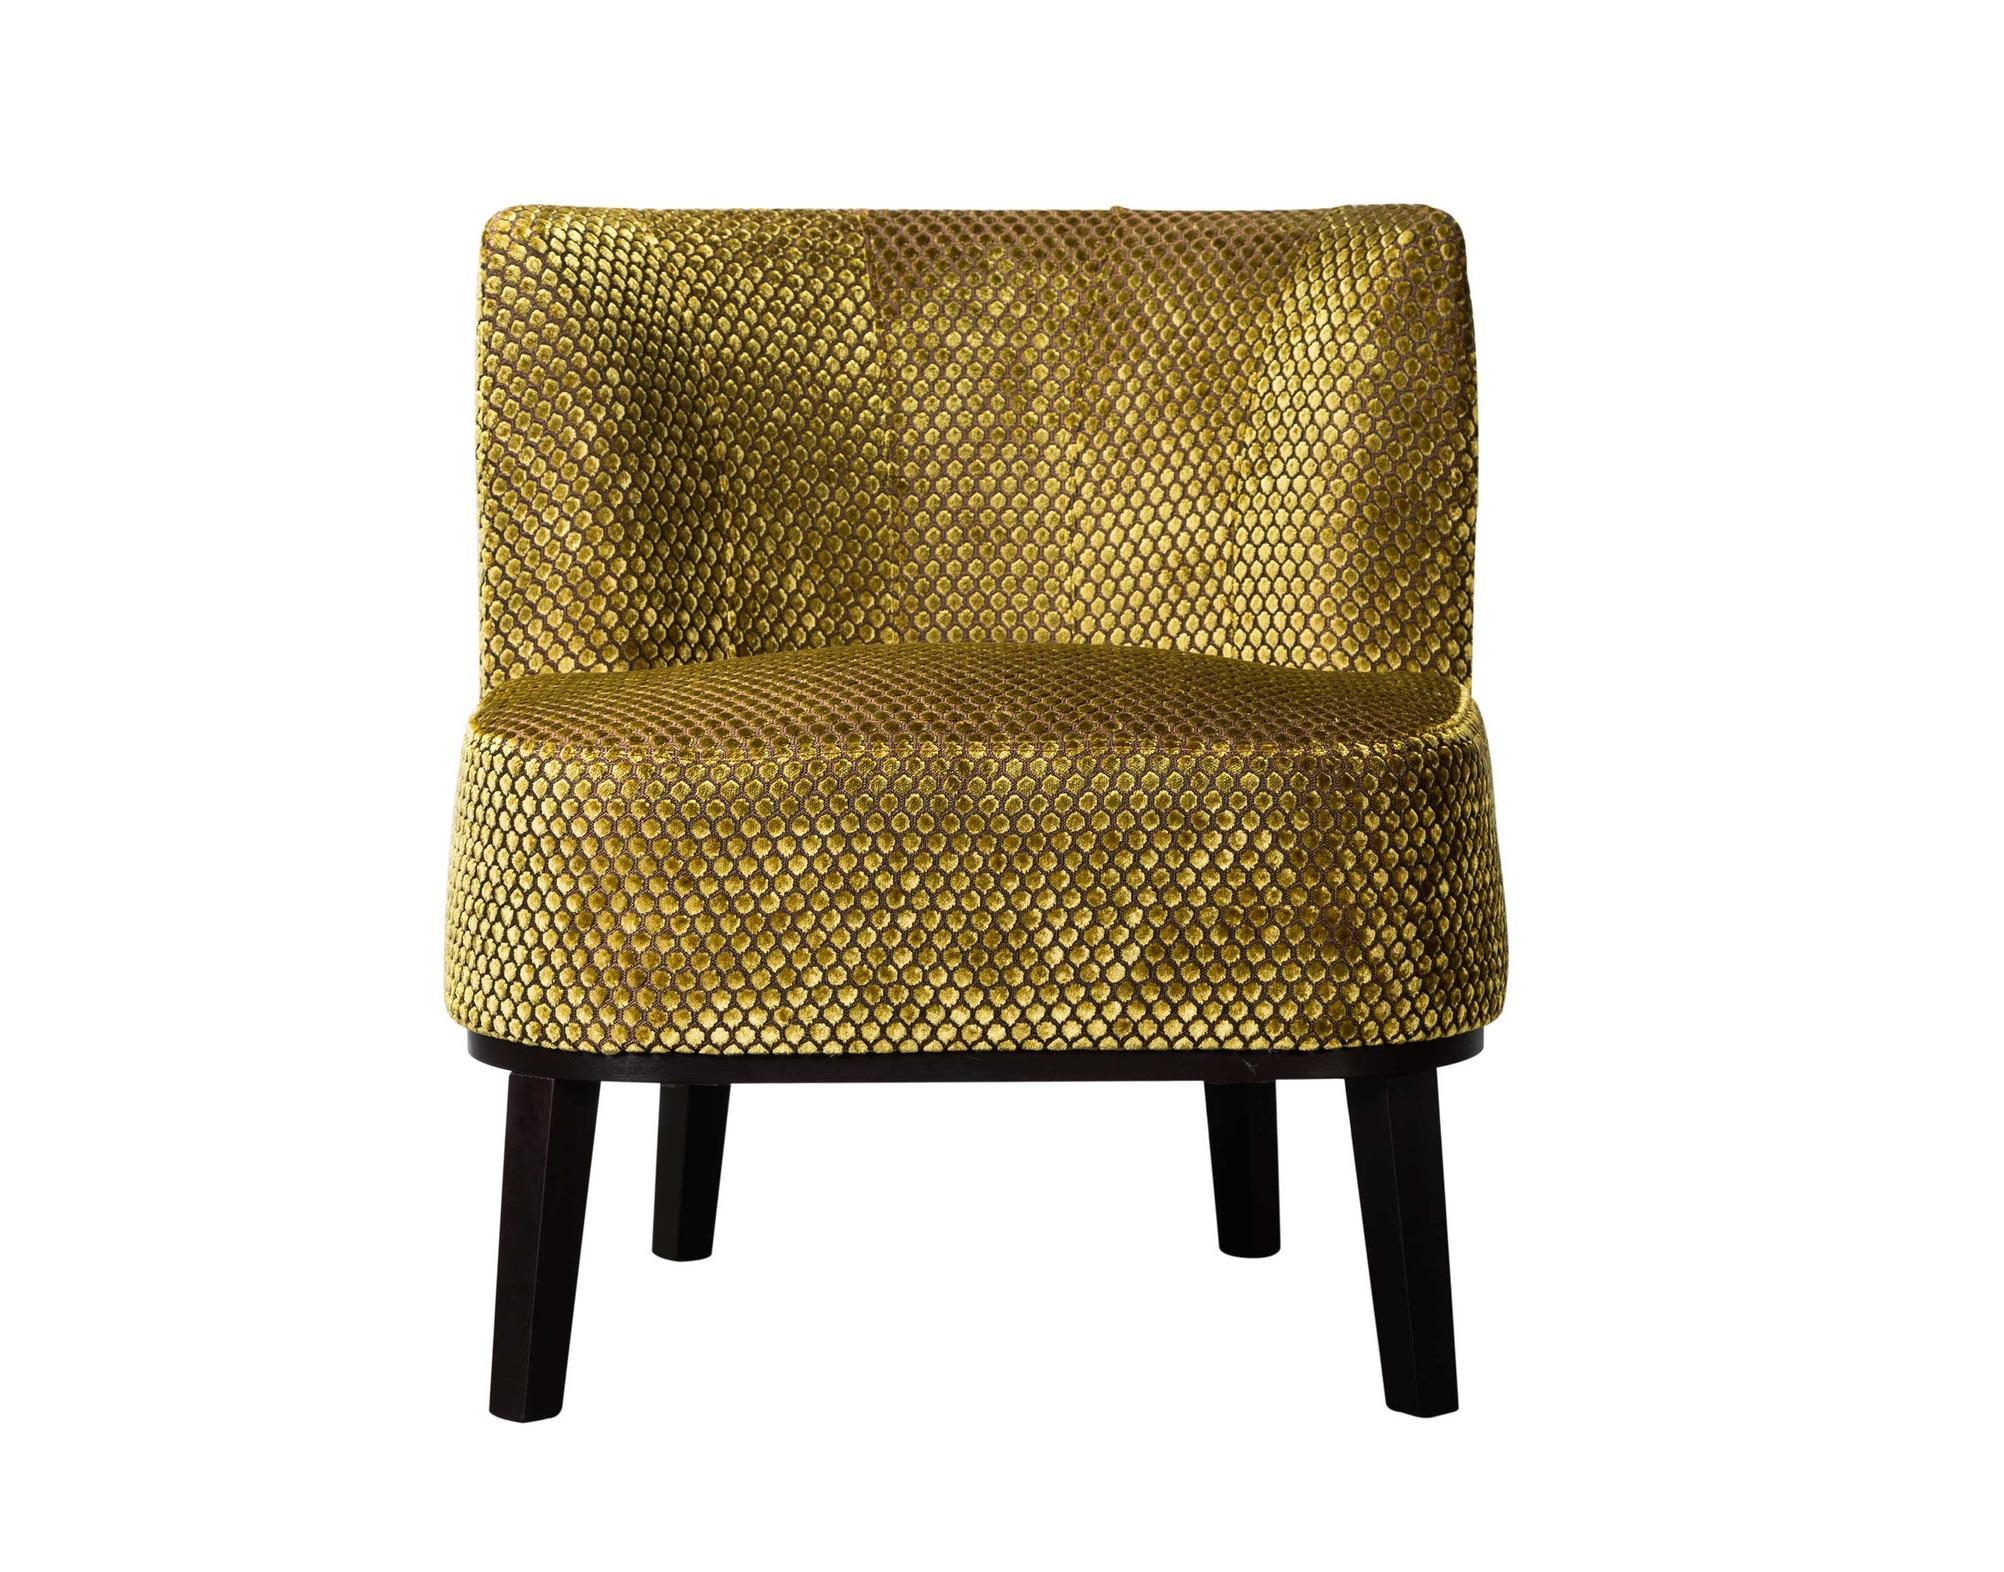 Кресло Шафран КантриПолукресла<br>Высота сидения: 48,5 см<br><br>kit: None<br>gender: None